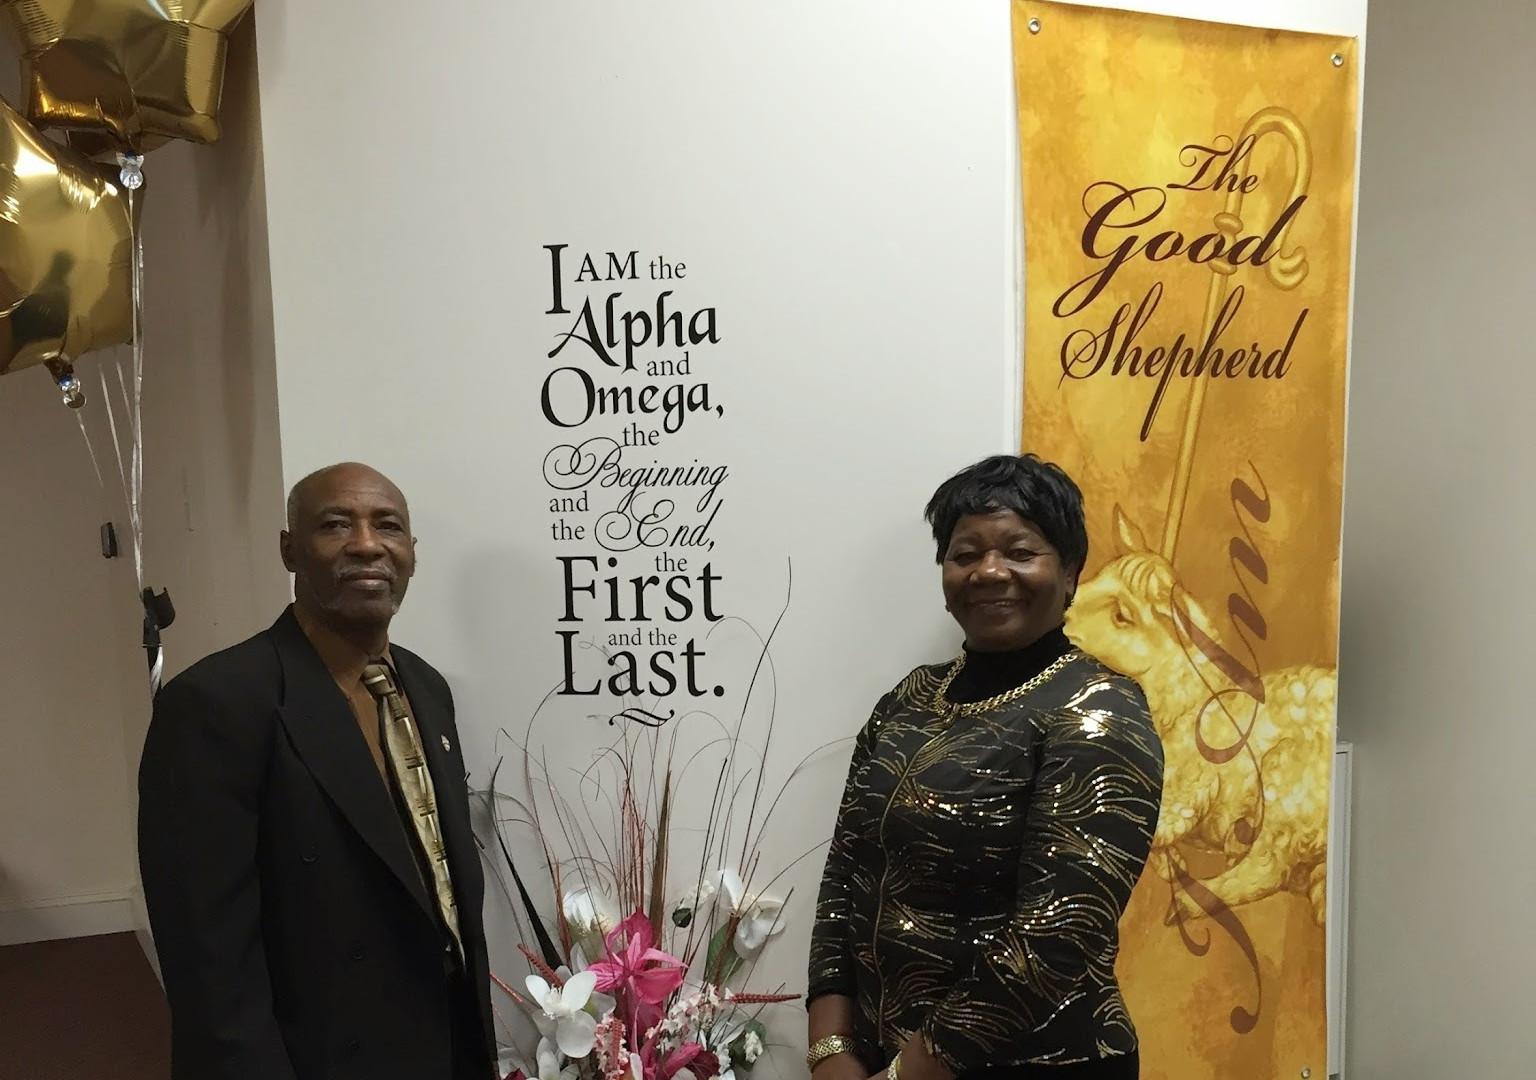 Pastor John S. Miller, Sr. and First Lady Veronica Miller